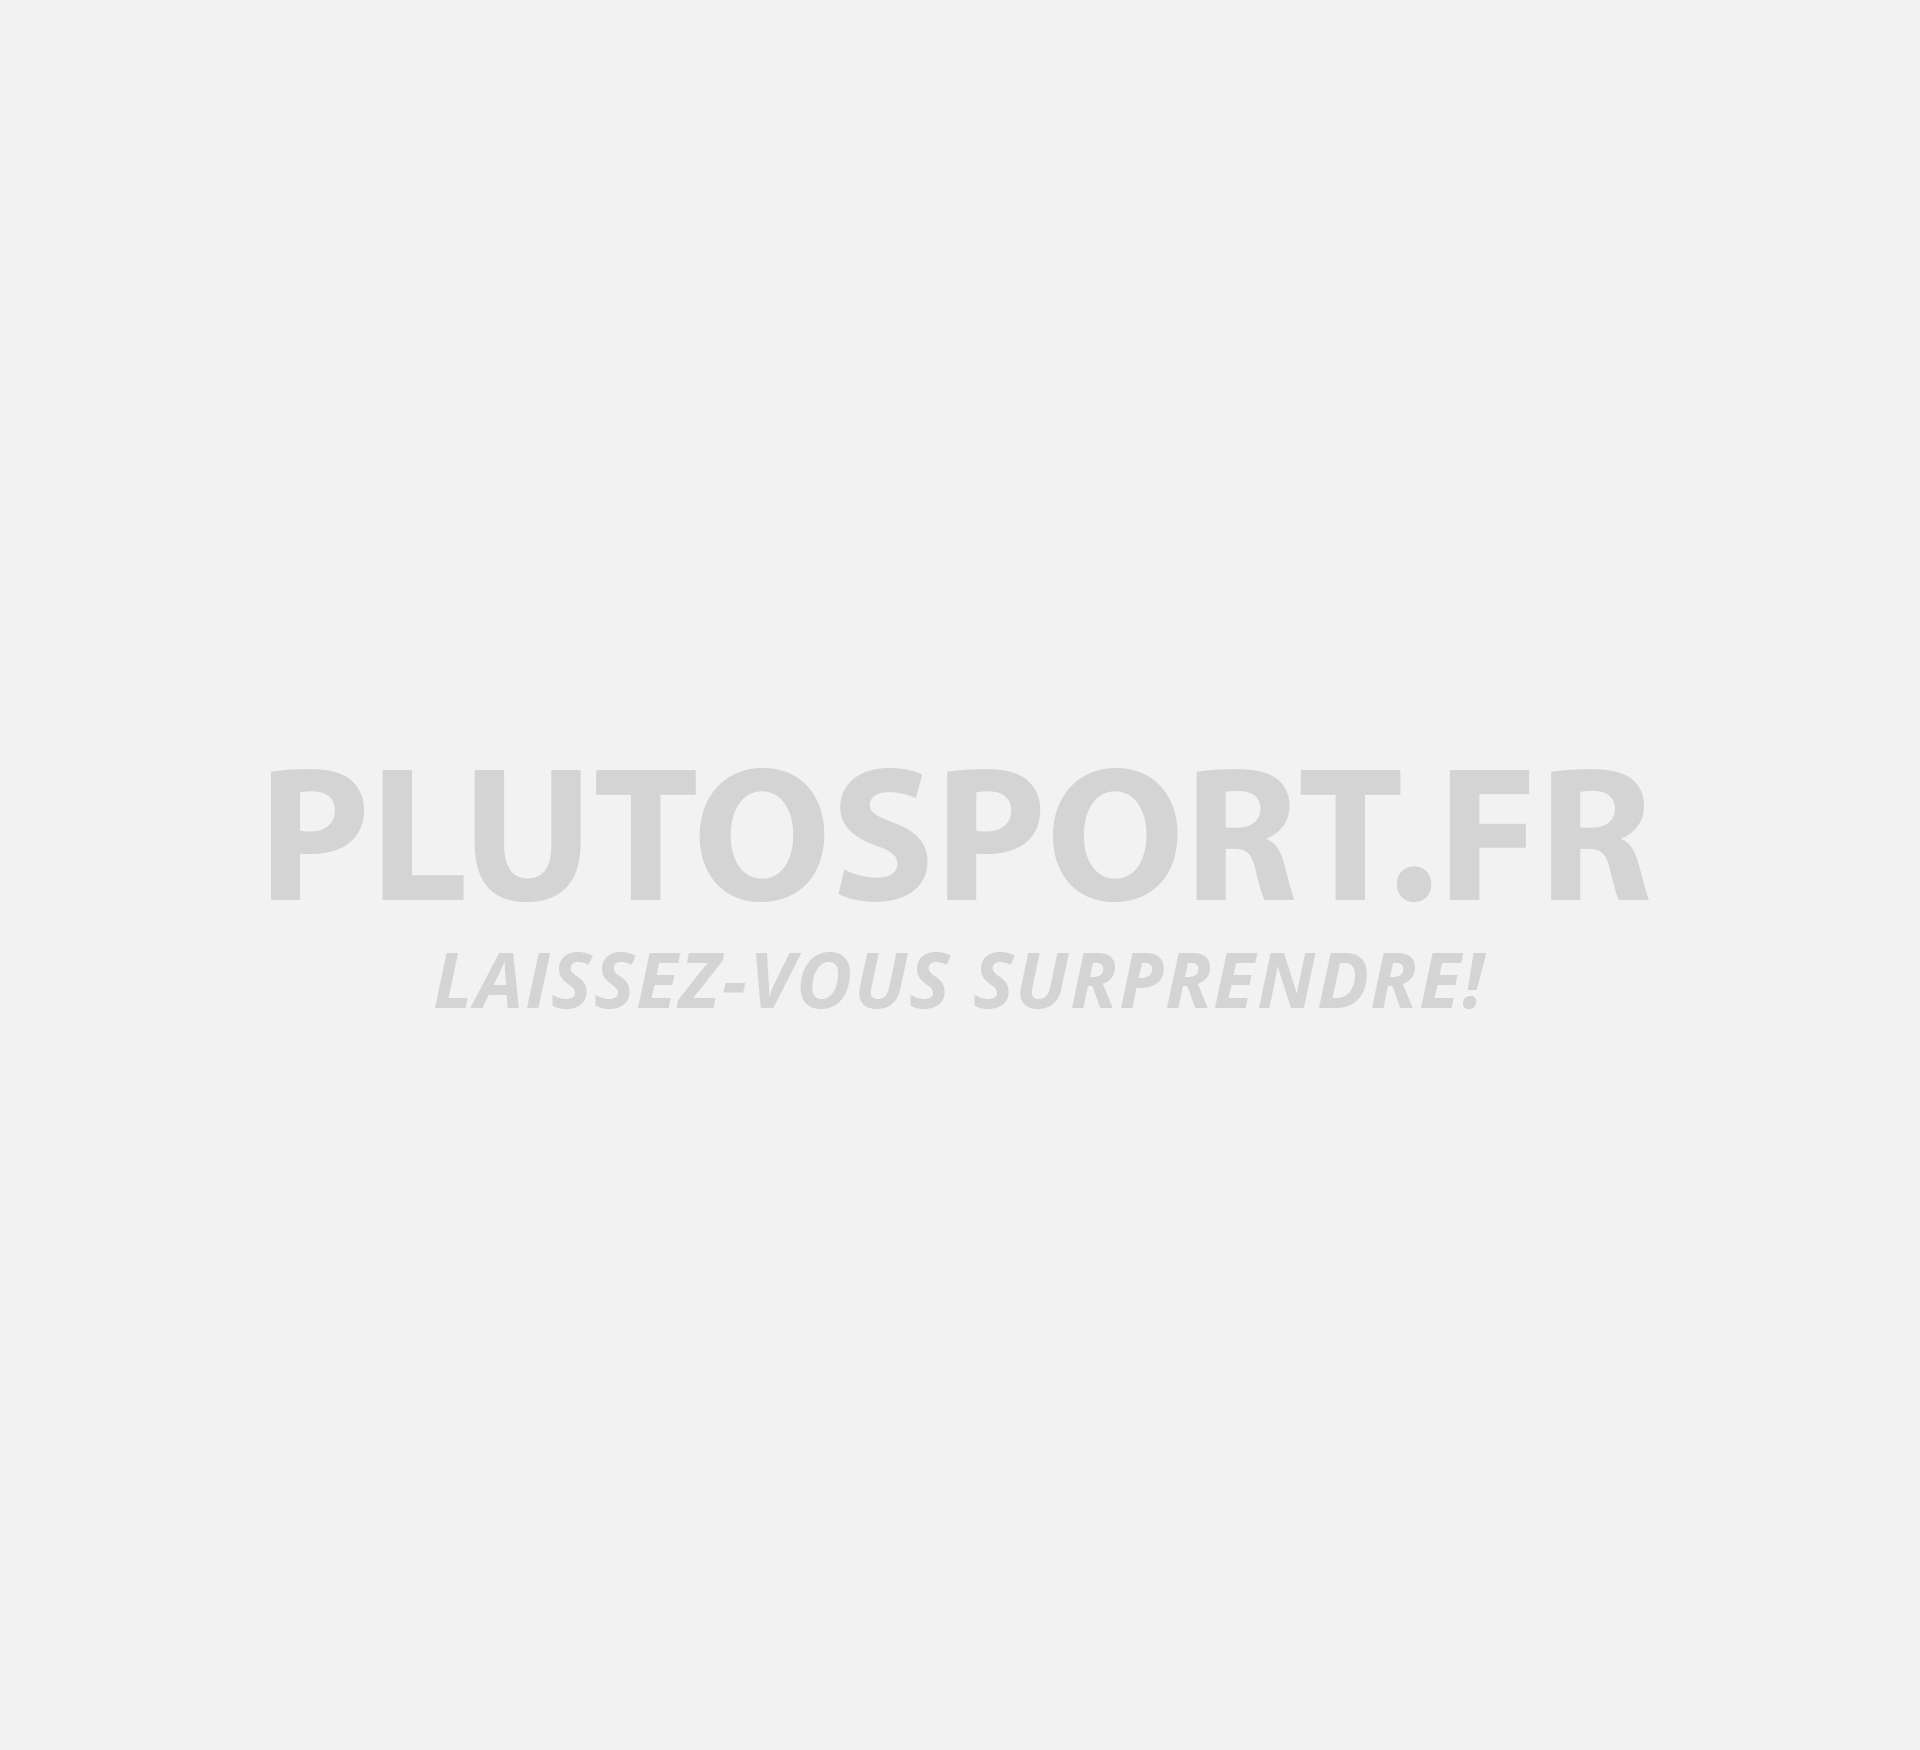 Le gilet à capuche pour hommes Nike Sportswear Winter Zip Hoody